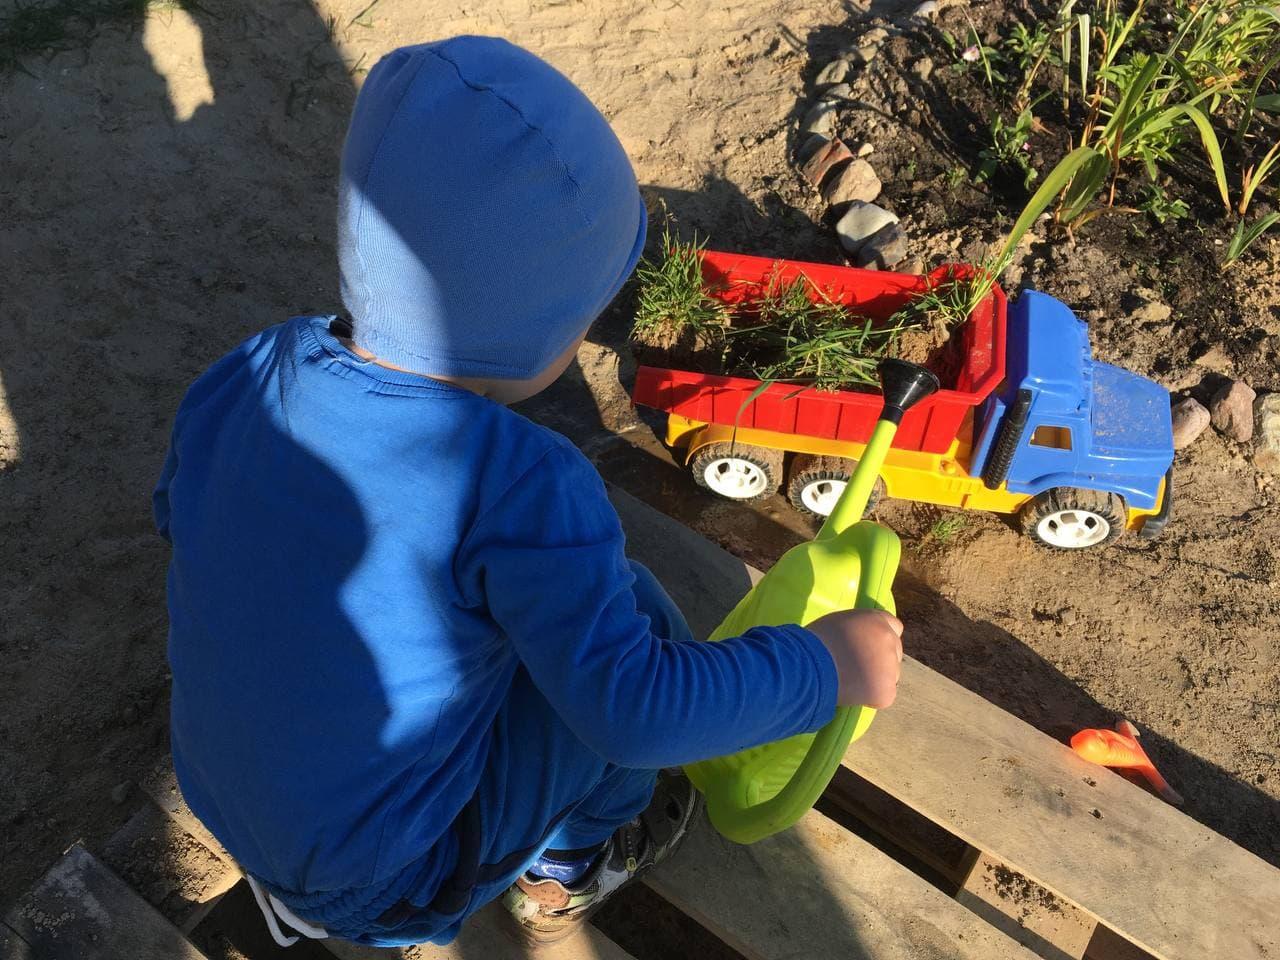 Ребенок на даче исследует происходящее